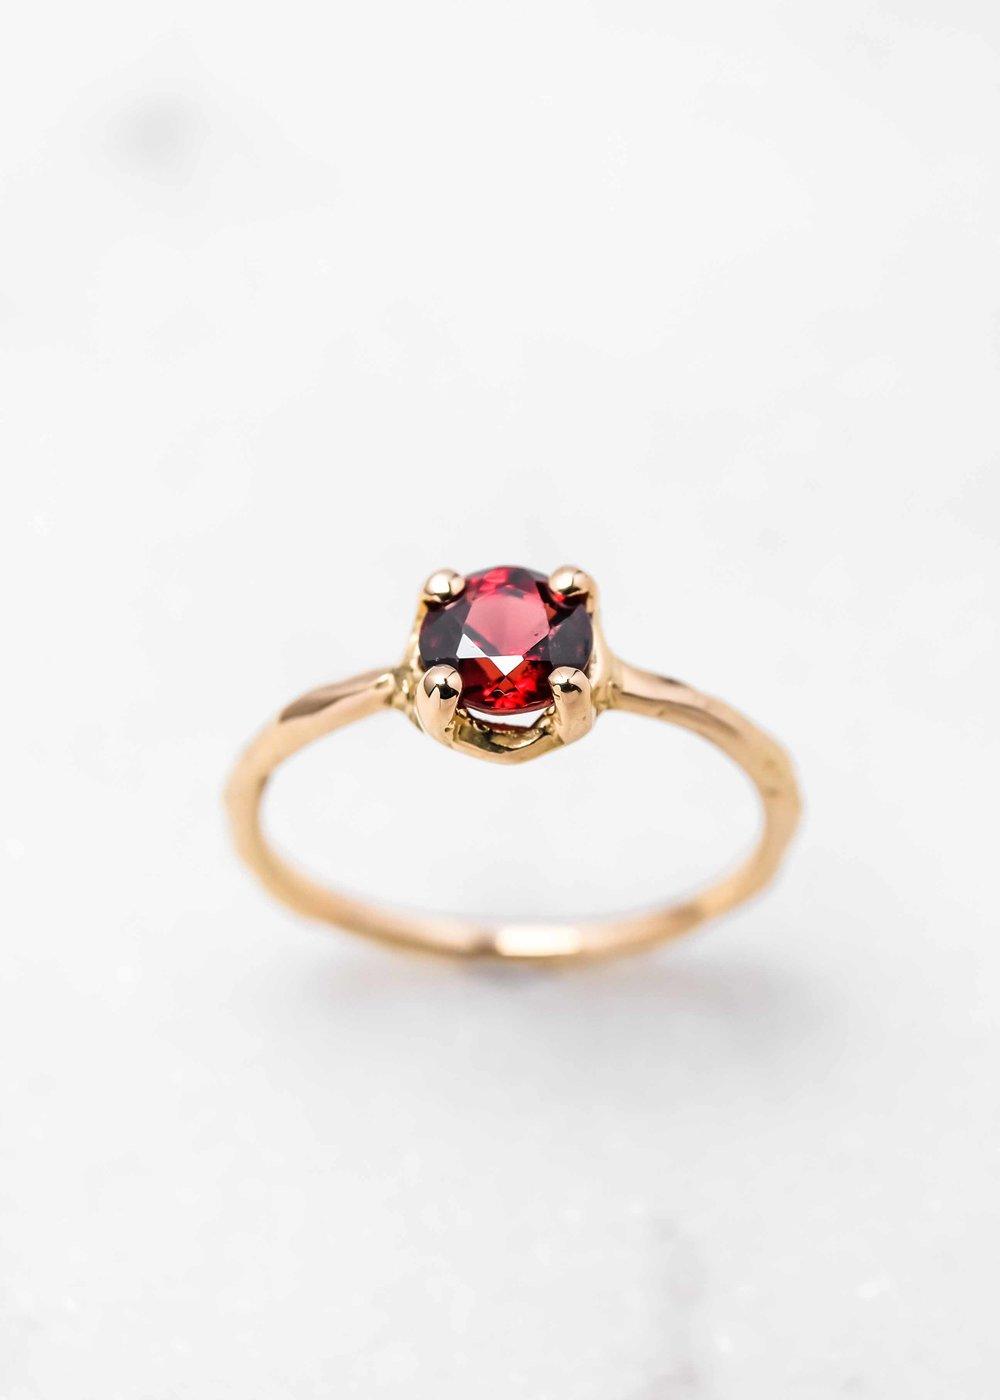 jewelry-wedding-ring-gold-grenat-the-black-alchemy-2.jpg